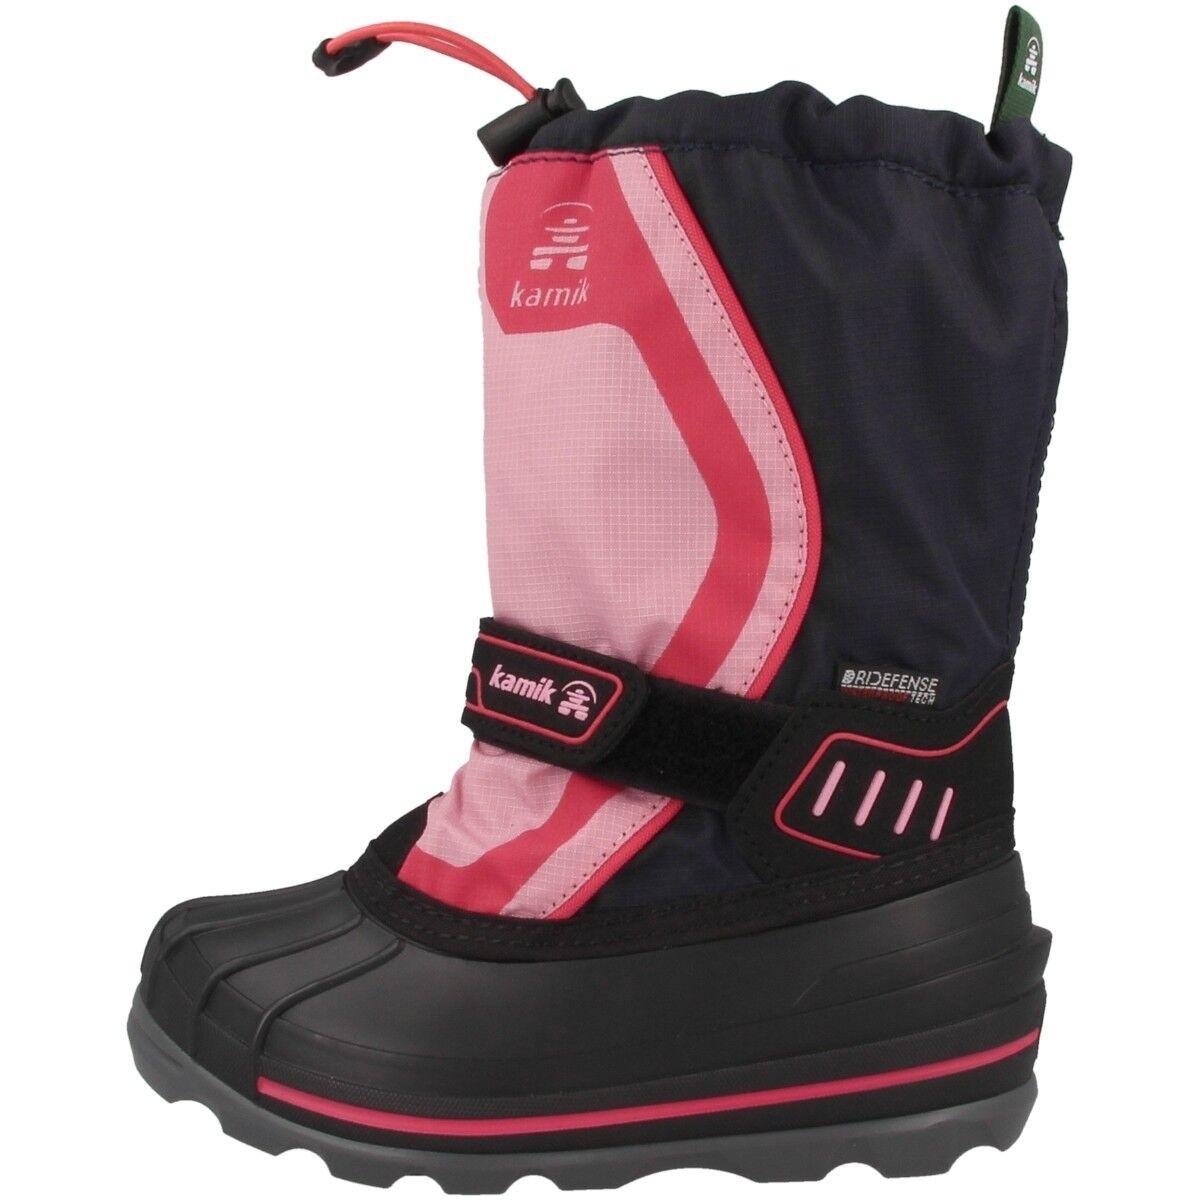 Kamik snowcoast 4 Bambini Scarpe Stivali Invernali Stivali Stivali NAVY PINK nk8852-nav